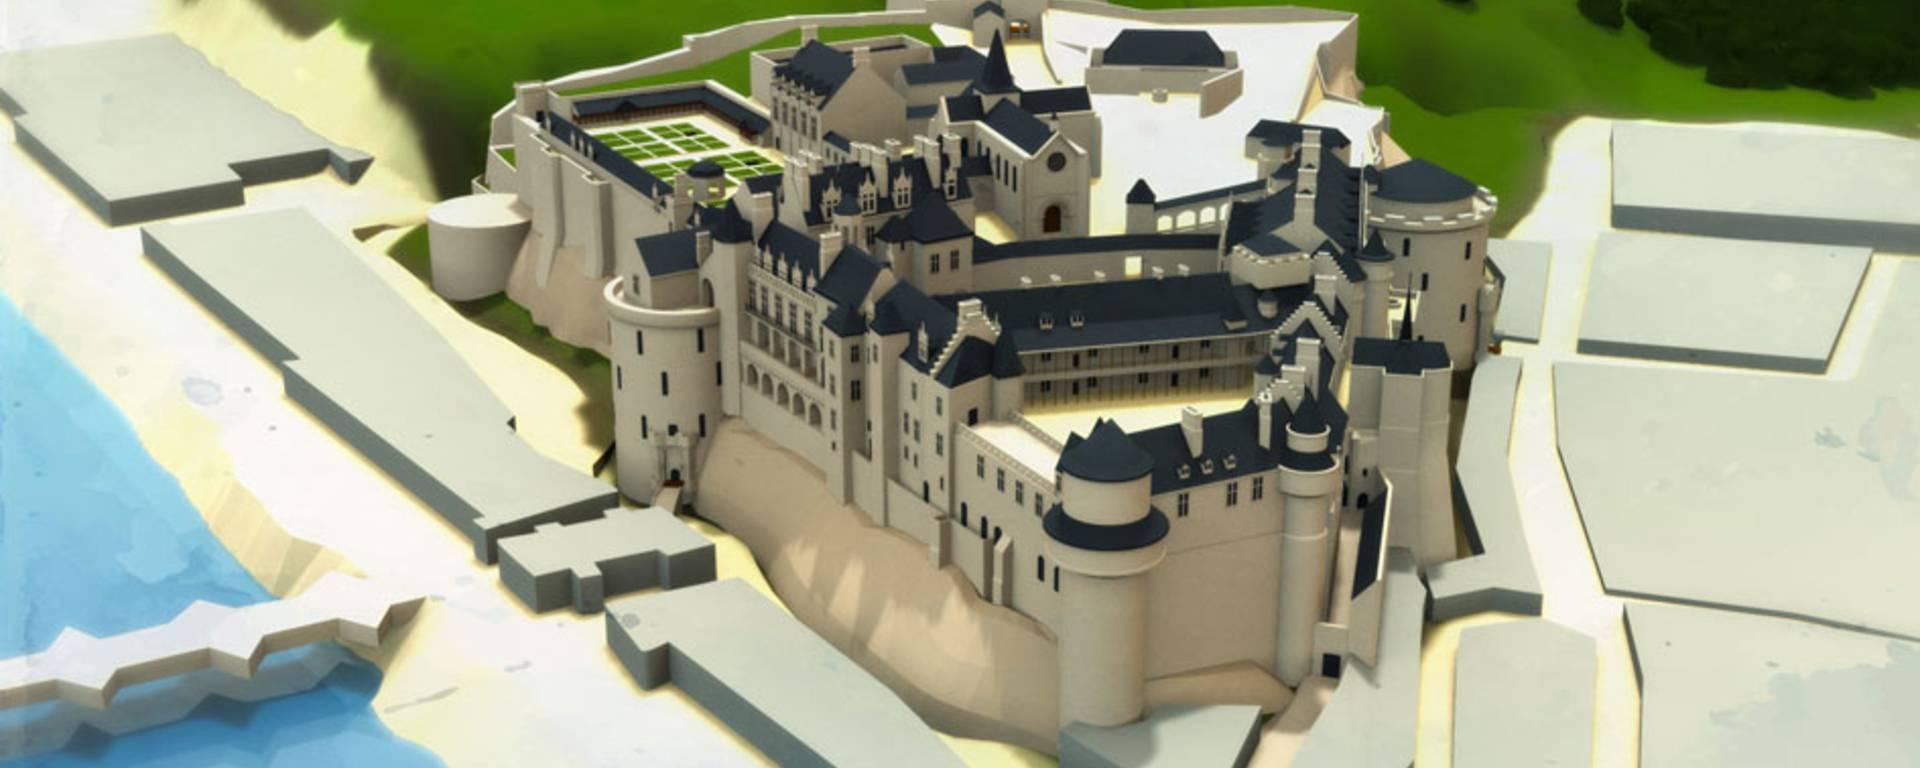 Le château au temps de Catherine de Médicis